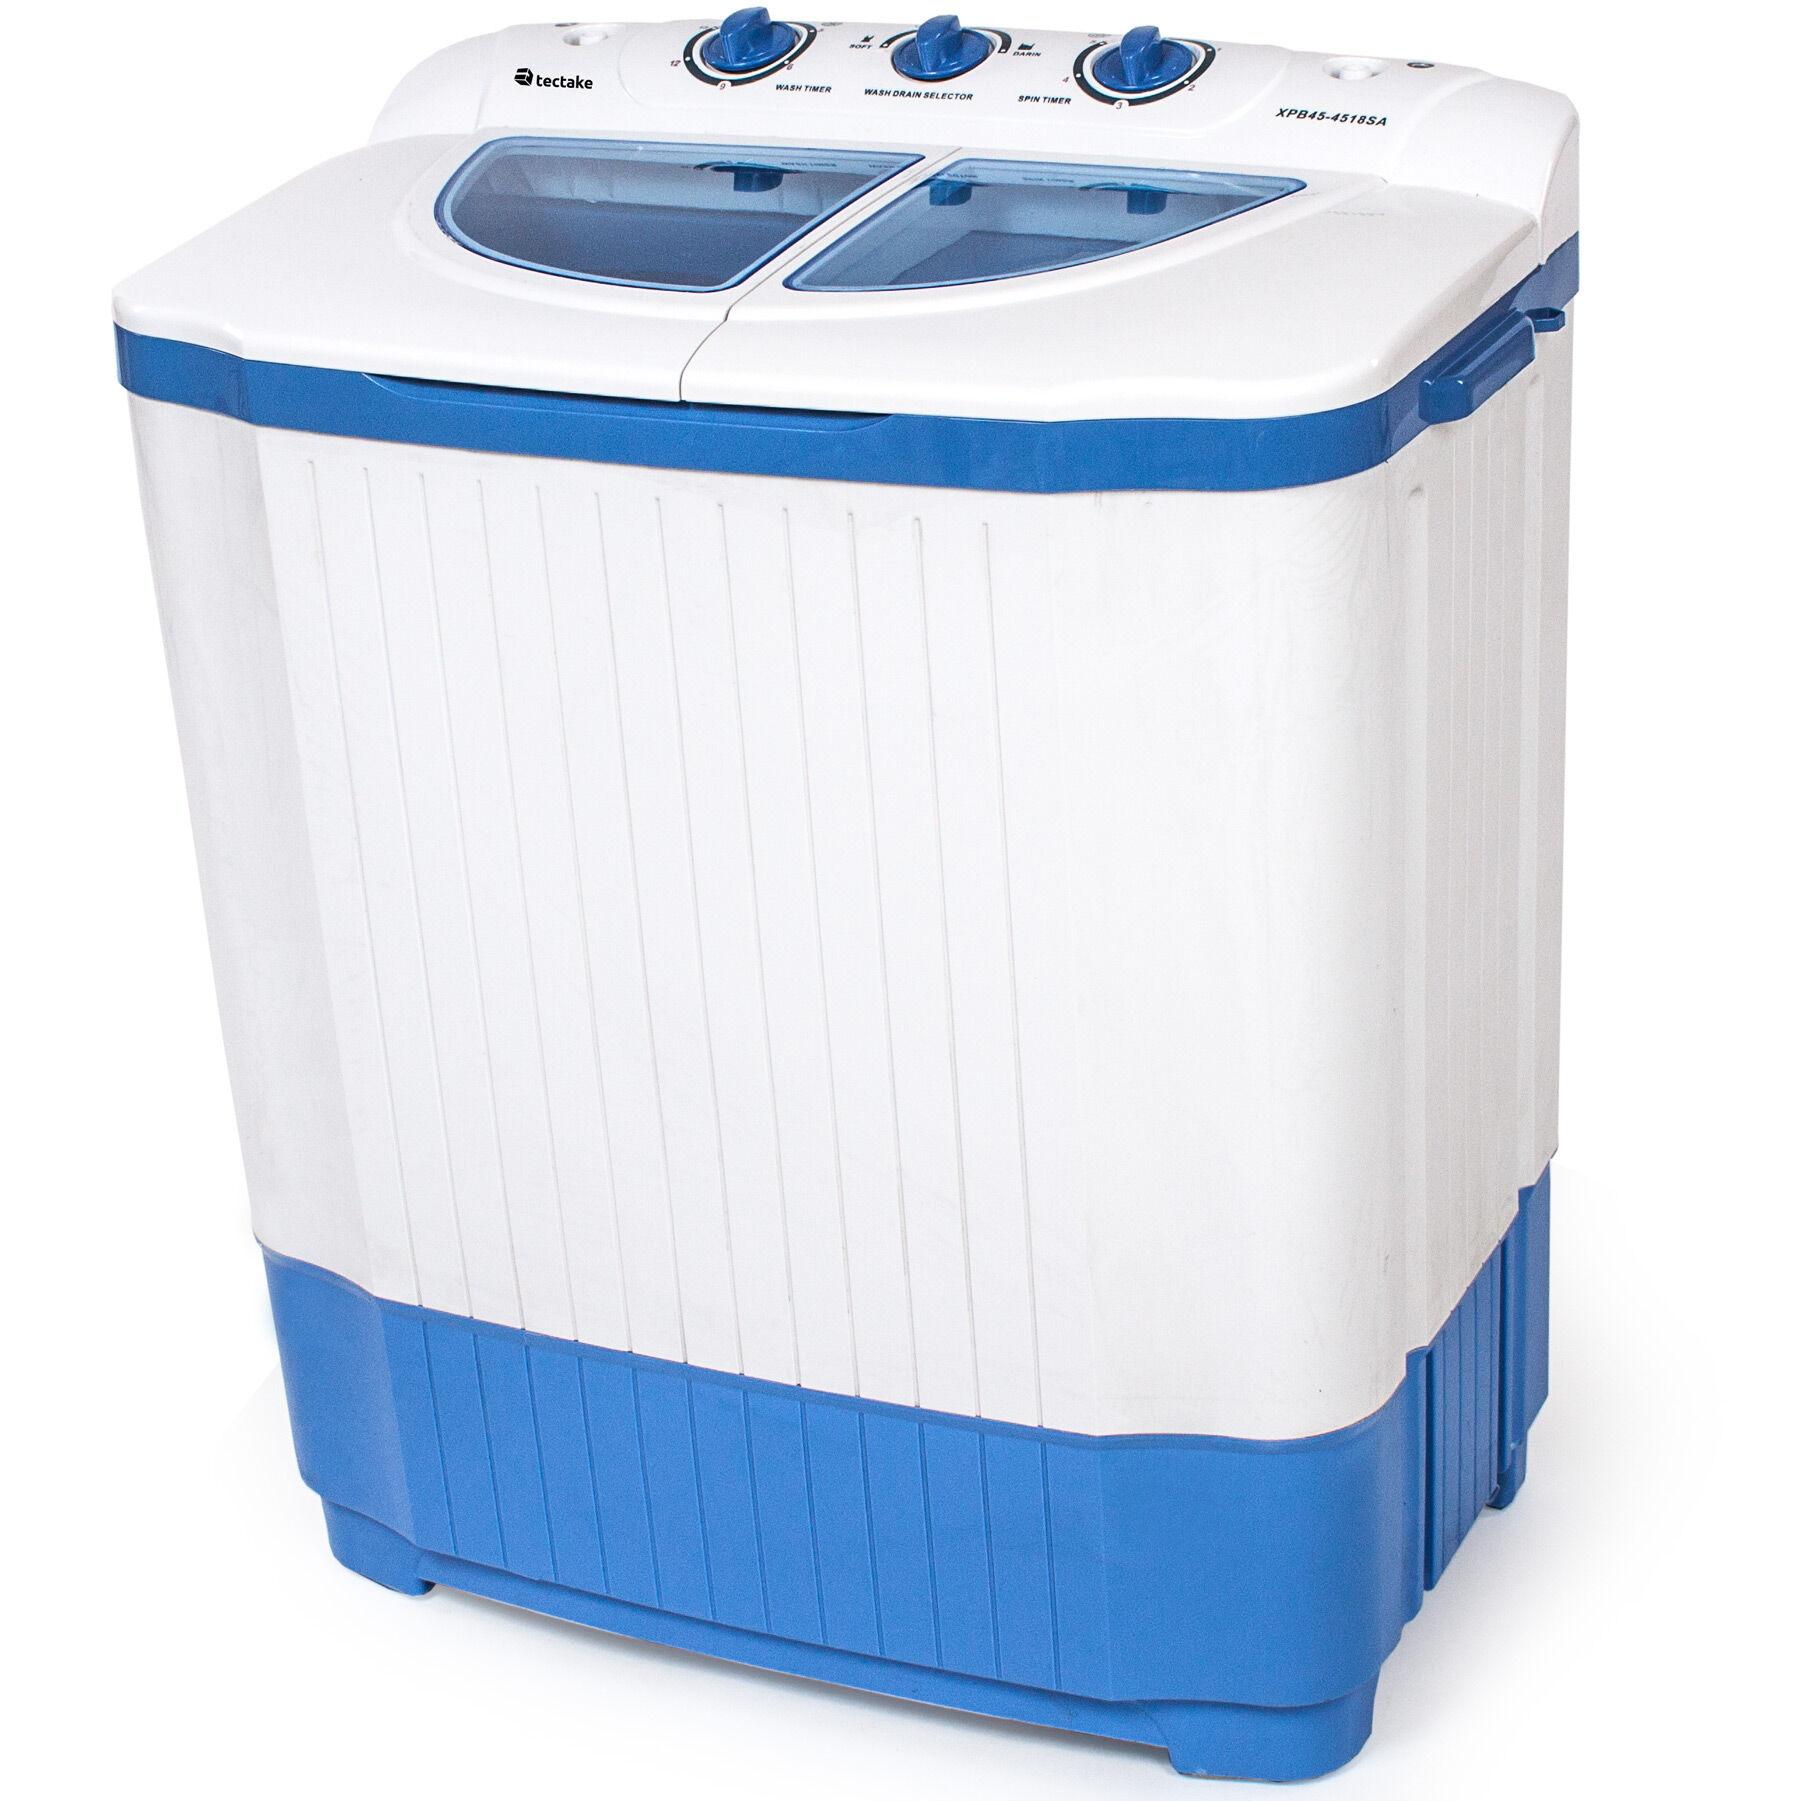 tectake minilavatrice da 4,5 kg con centrifuga da 3,5 kg - bianco